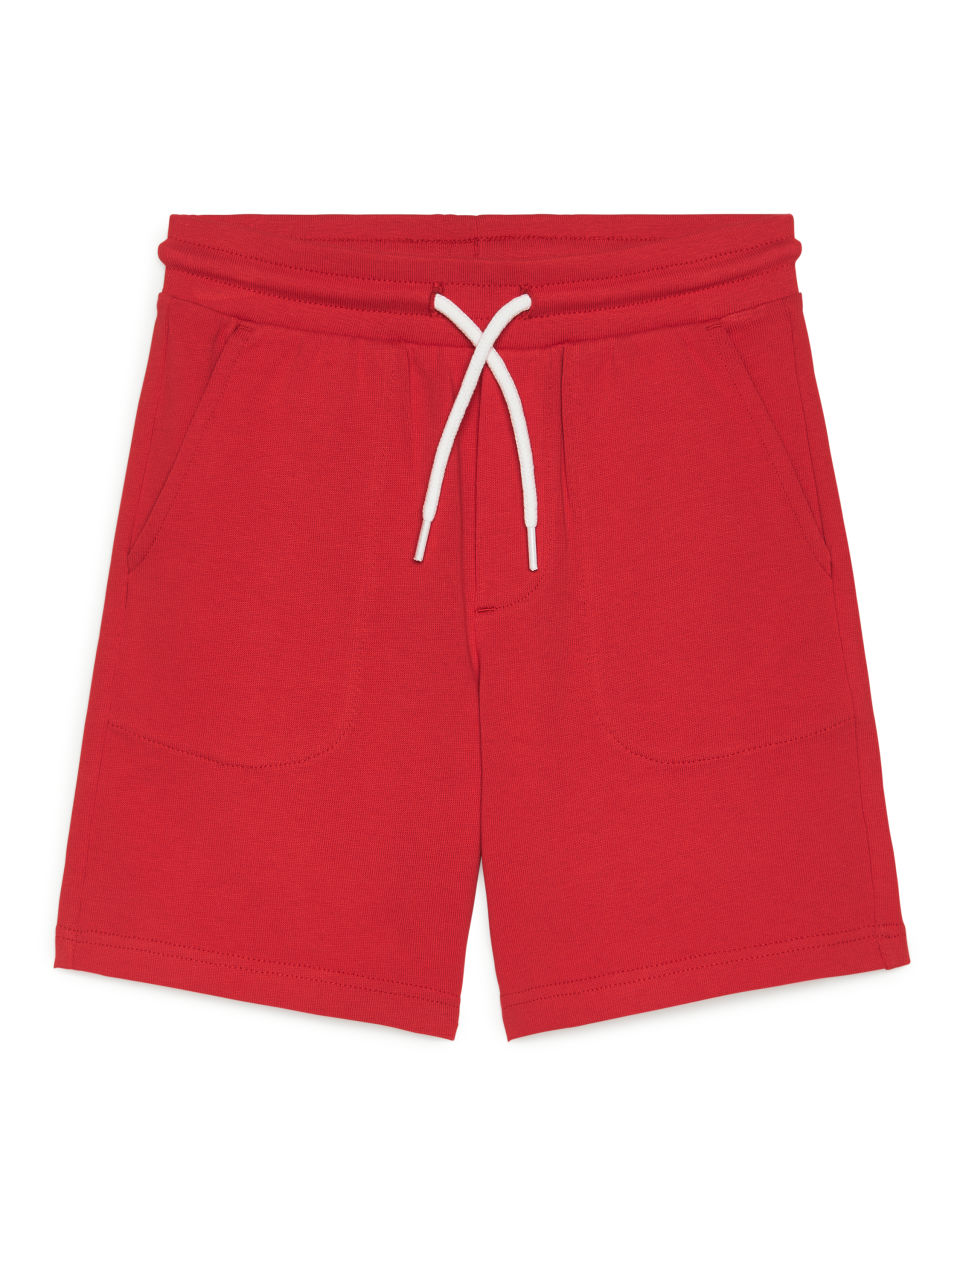 Elastic-Waist Shorts - Red